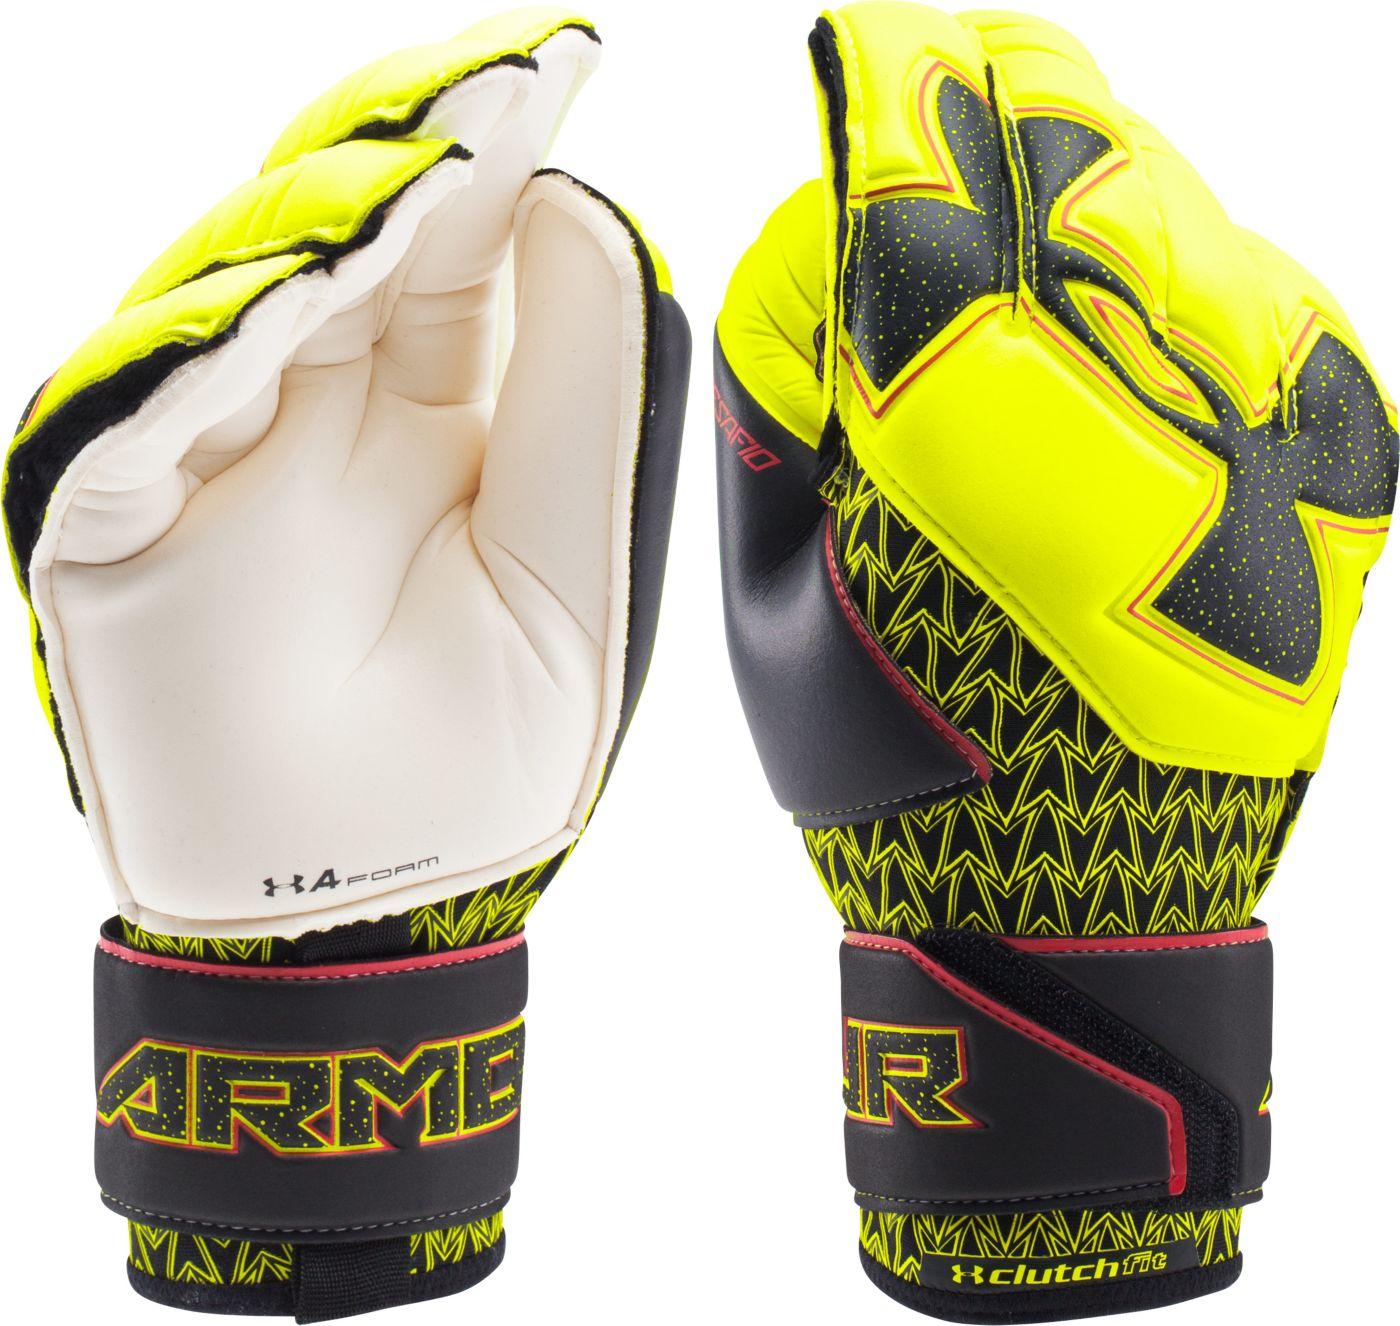 Under Armour Adult Desafio Premier Soccer Goalie Gloves